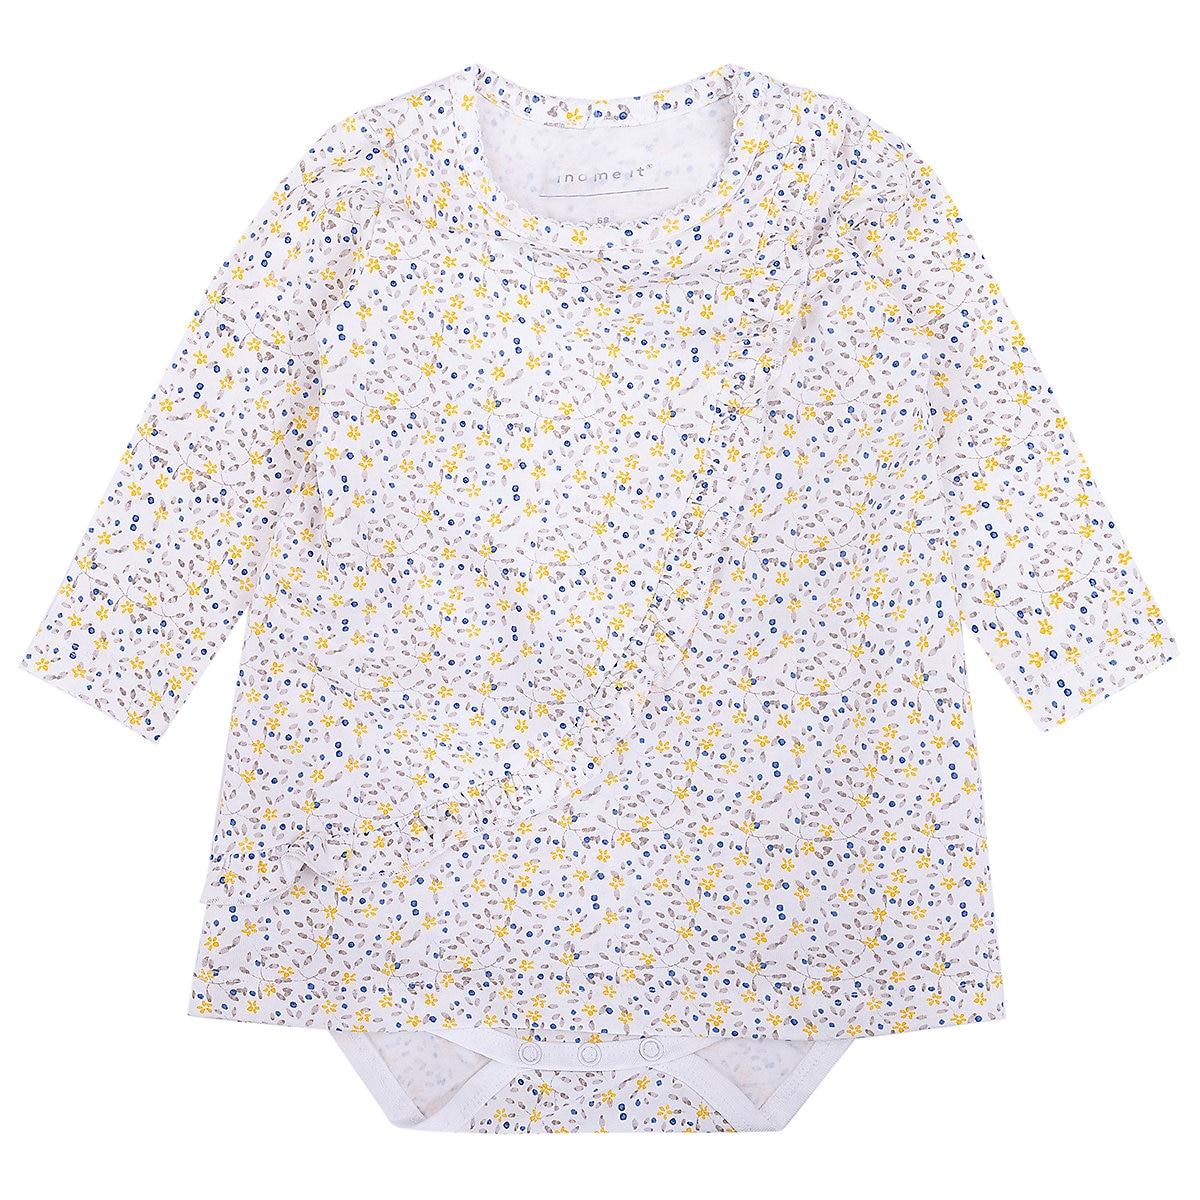 Фото - NAME IT Dresses 10626765 dress for girls baby clothing name it dresses 10626724 dress for girls baby clothing